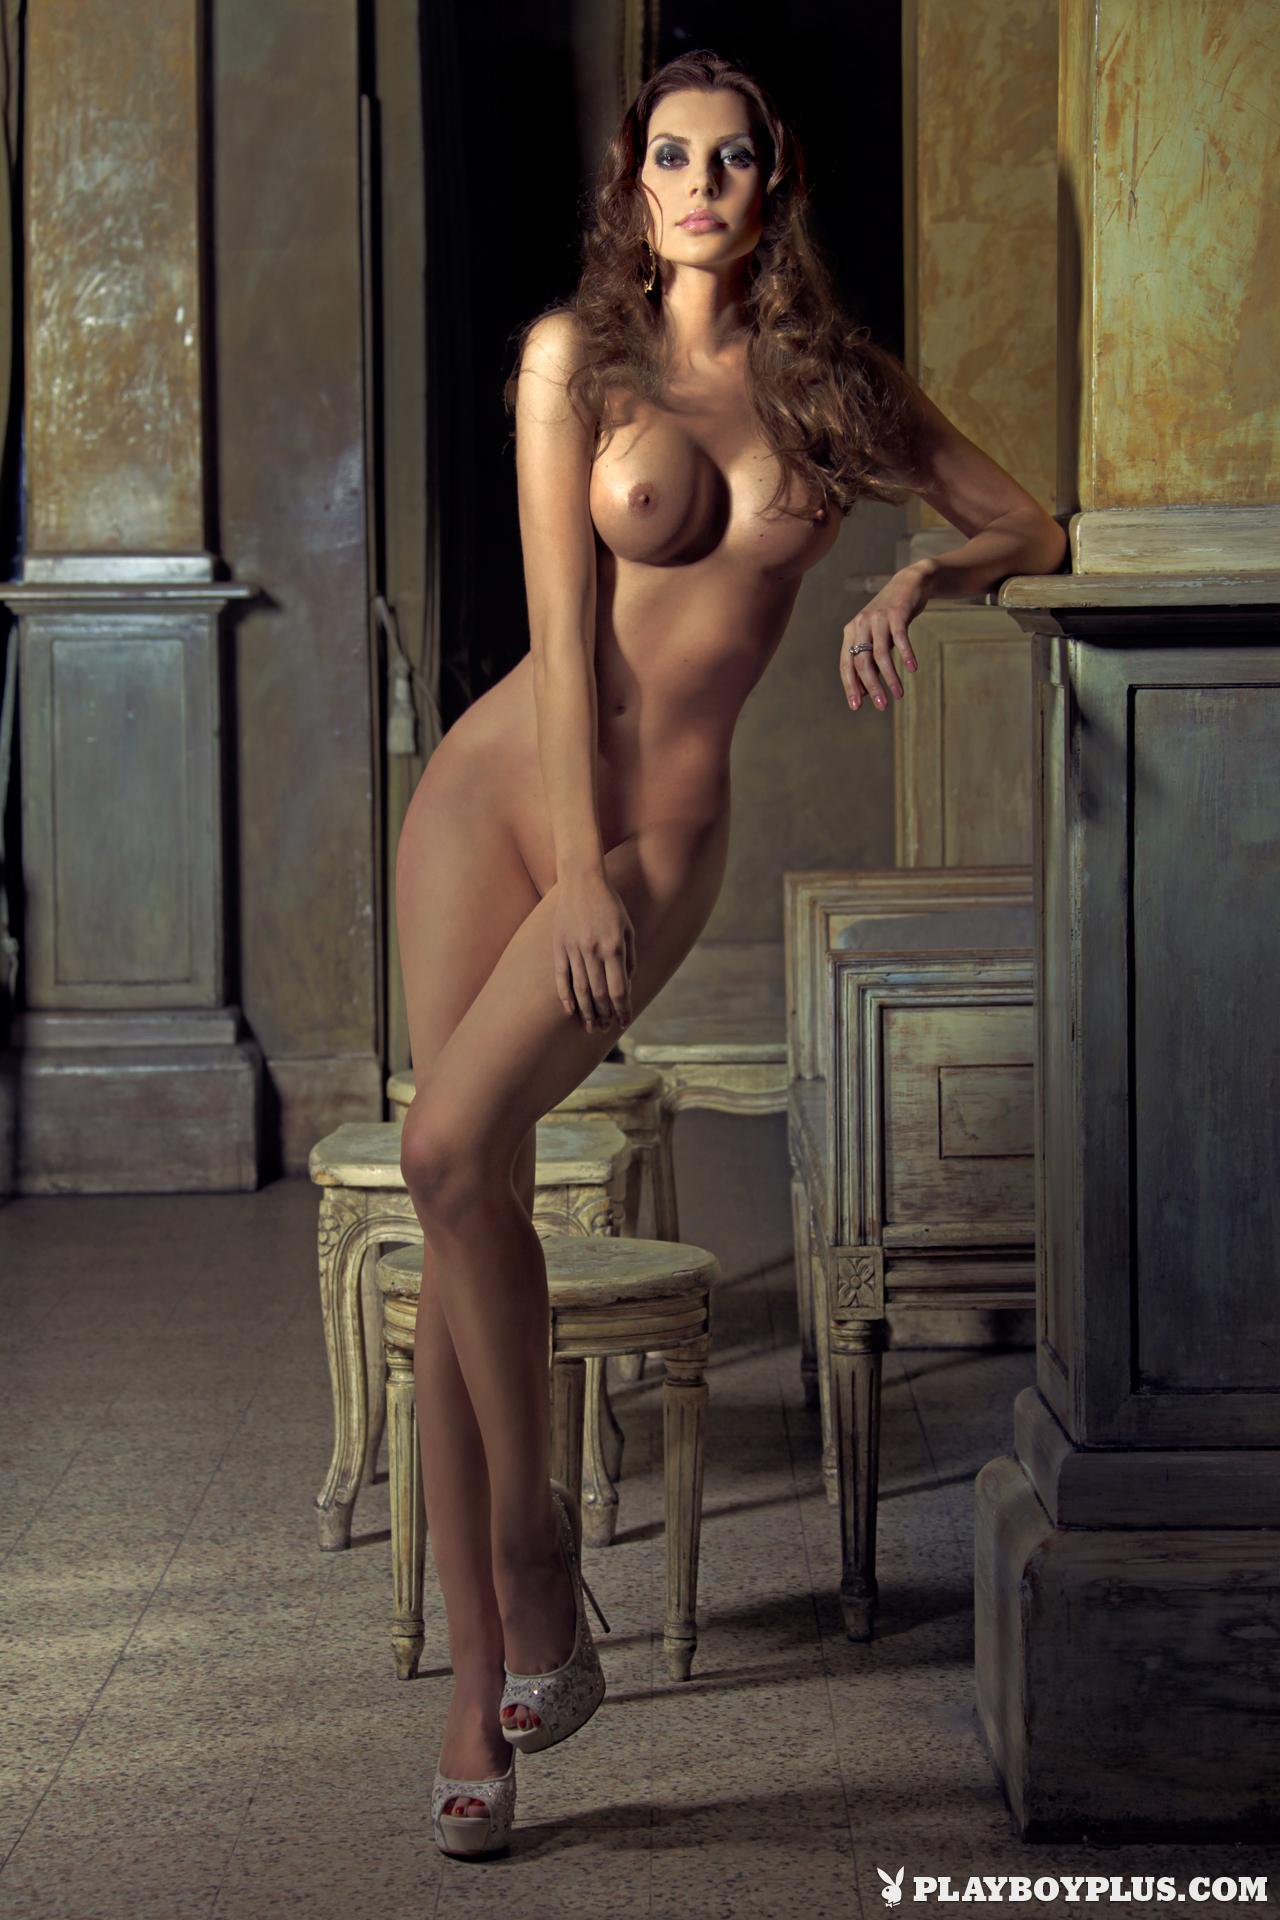 naked girls losing virginity